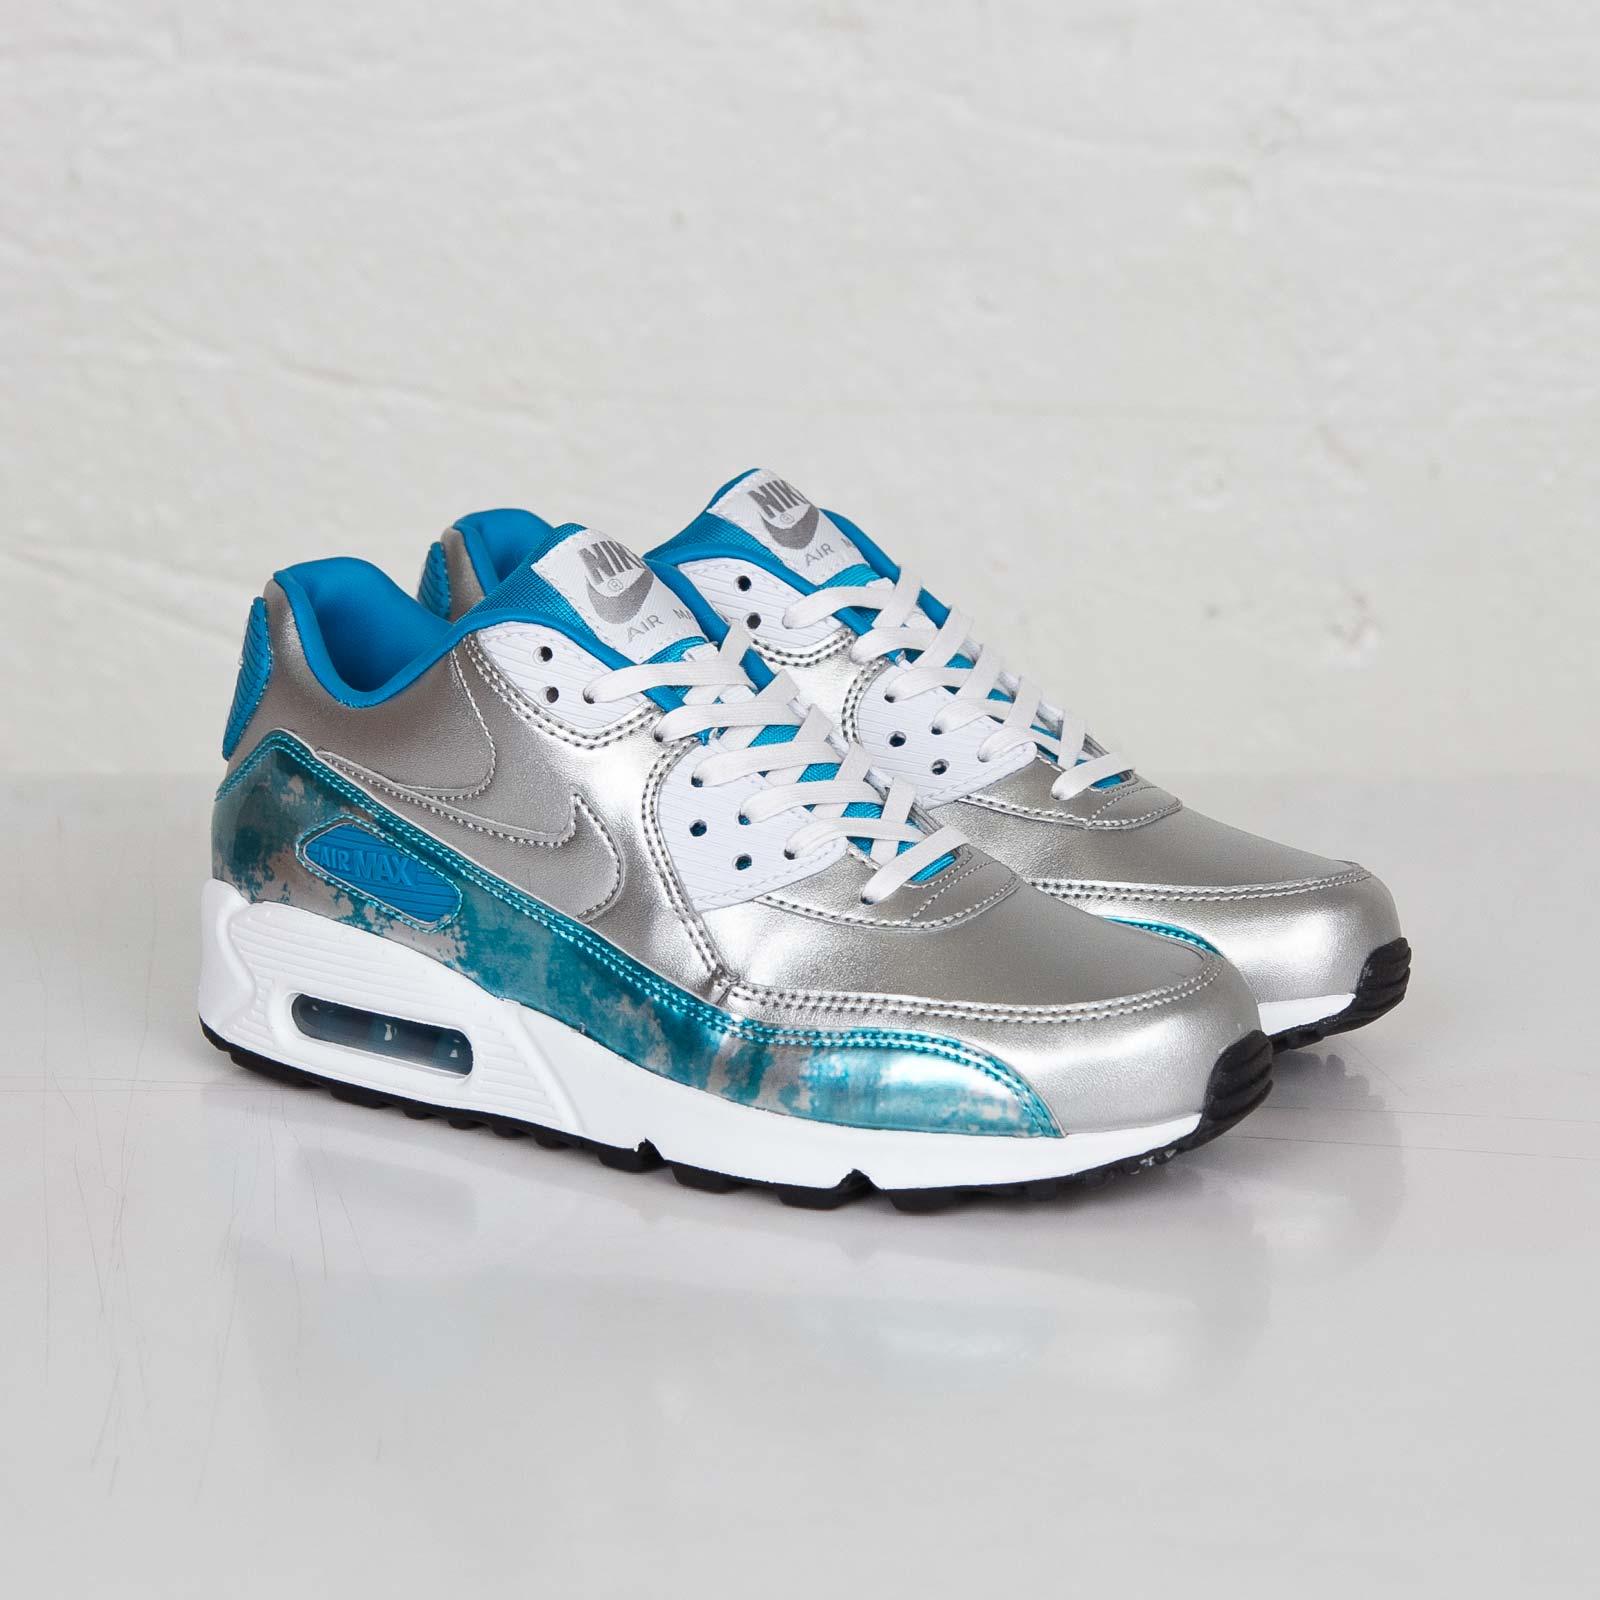 buy best shopping best price Nike Wmns Air Max 90 Premium QS - 744596-002 - Sneakersnstuff ...